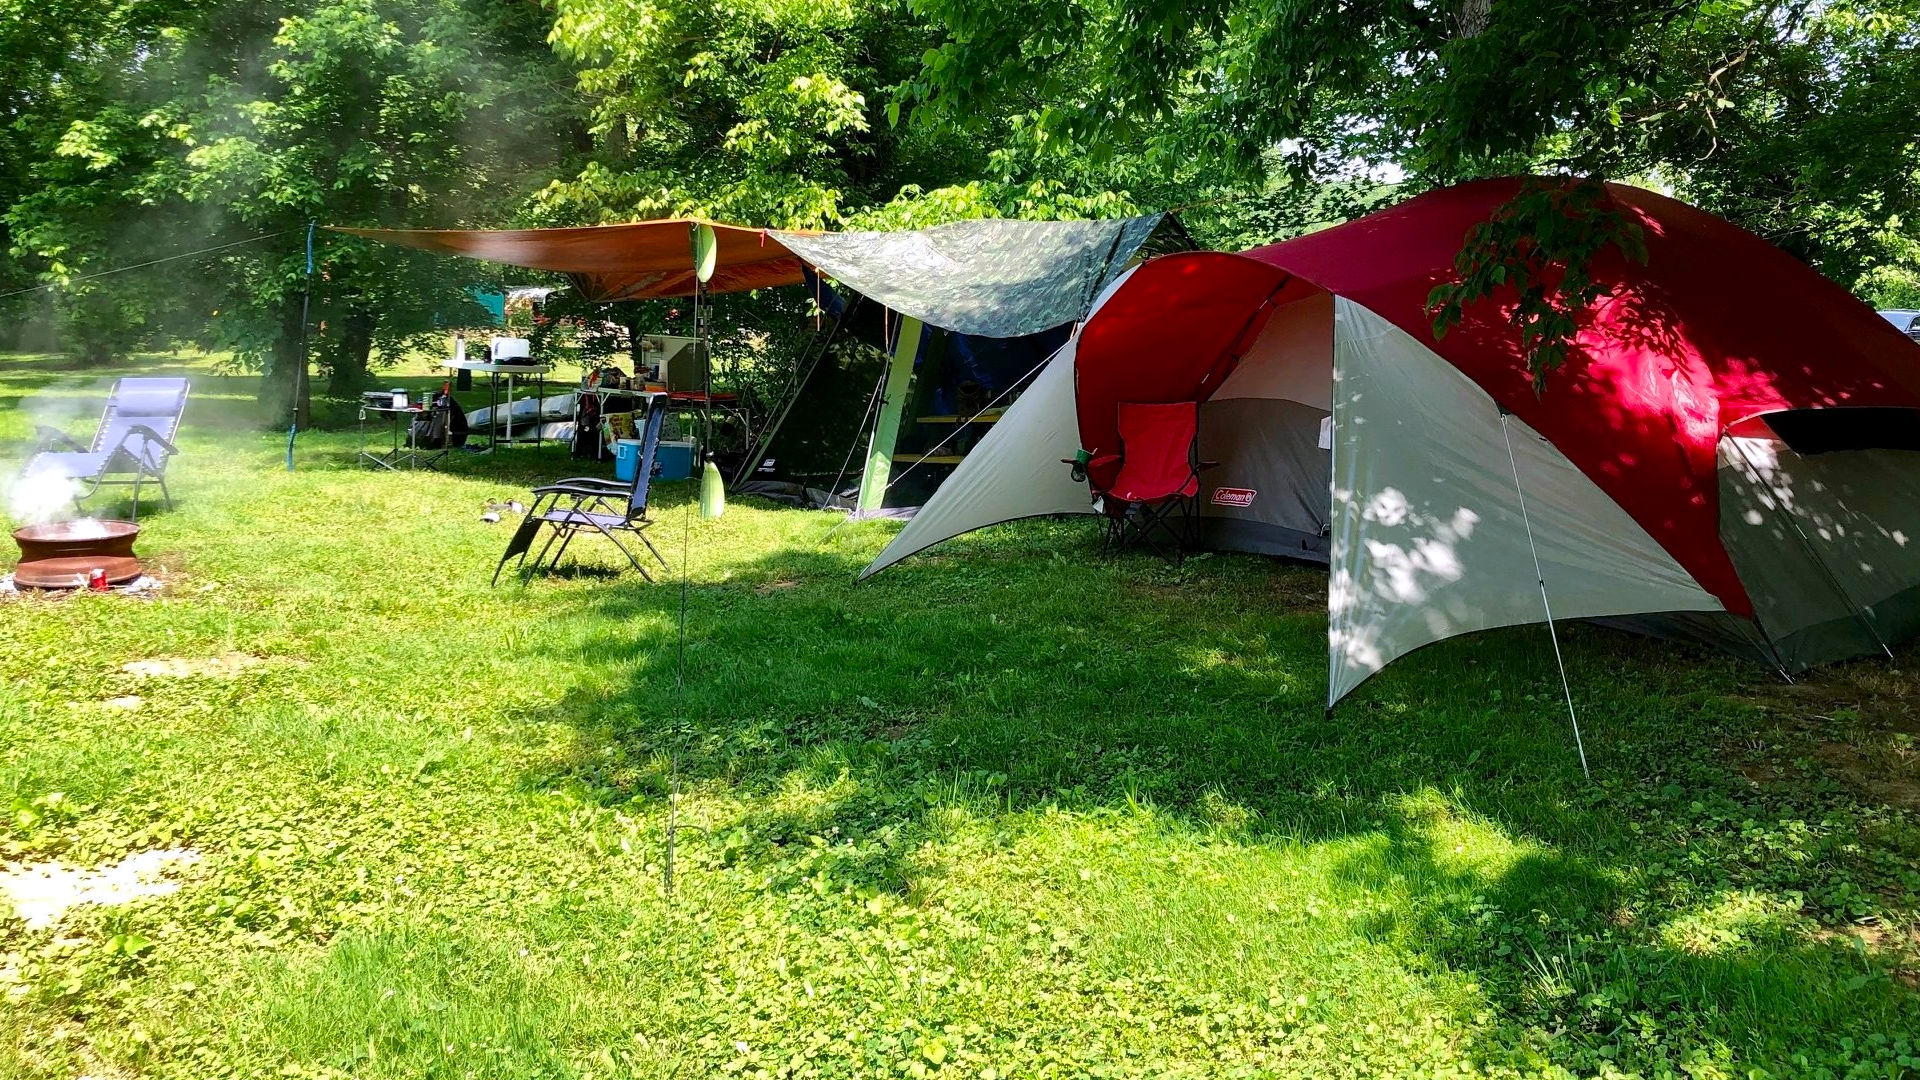 Hocking Hill Camp Sites